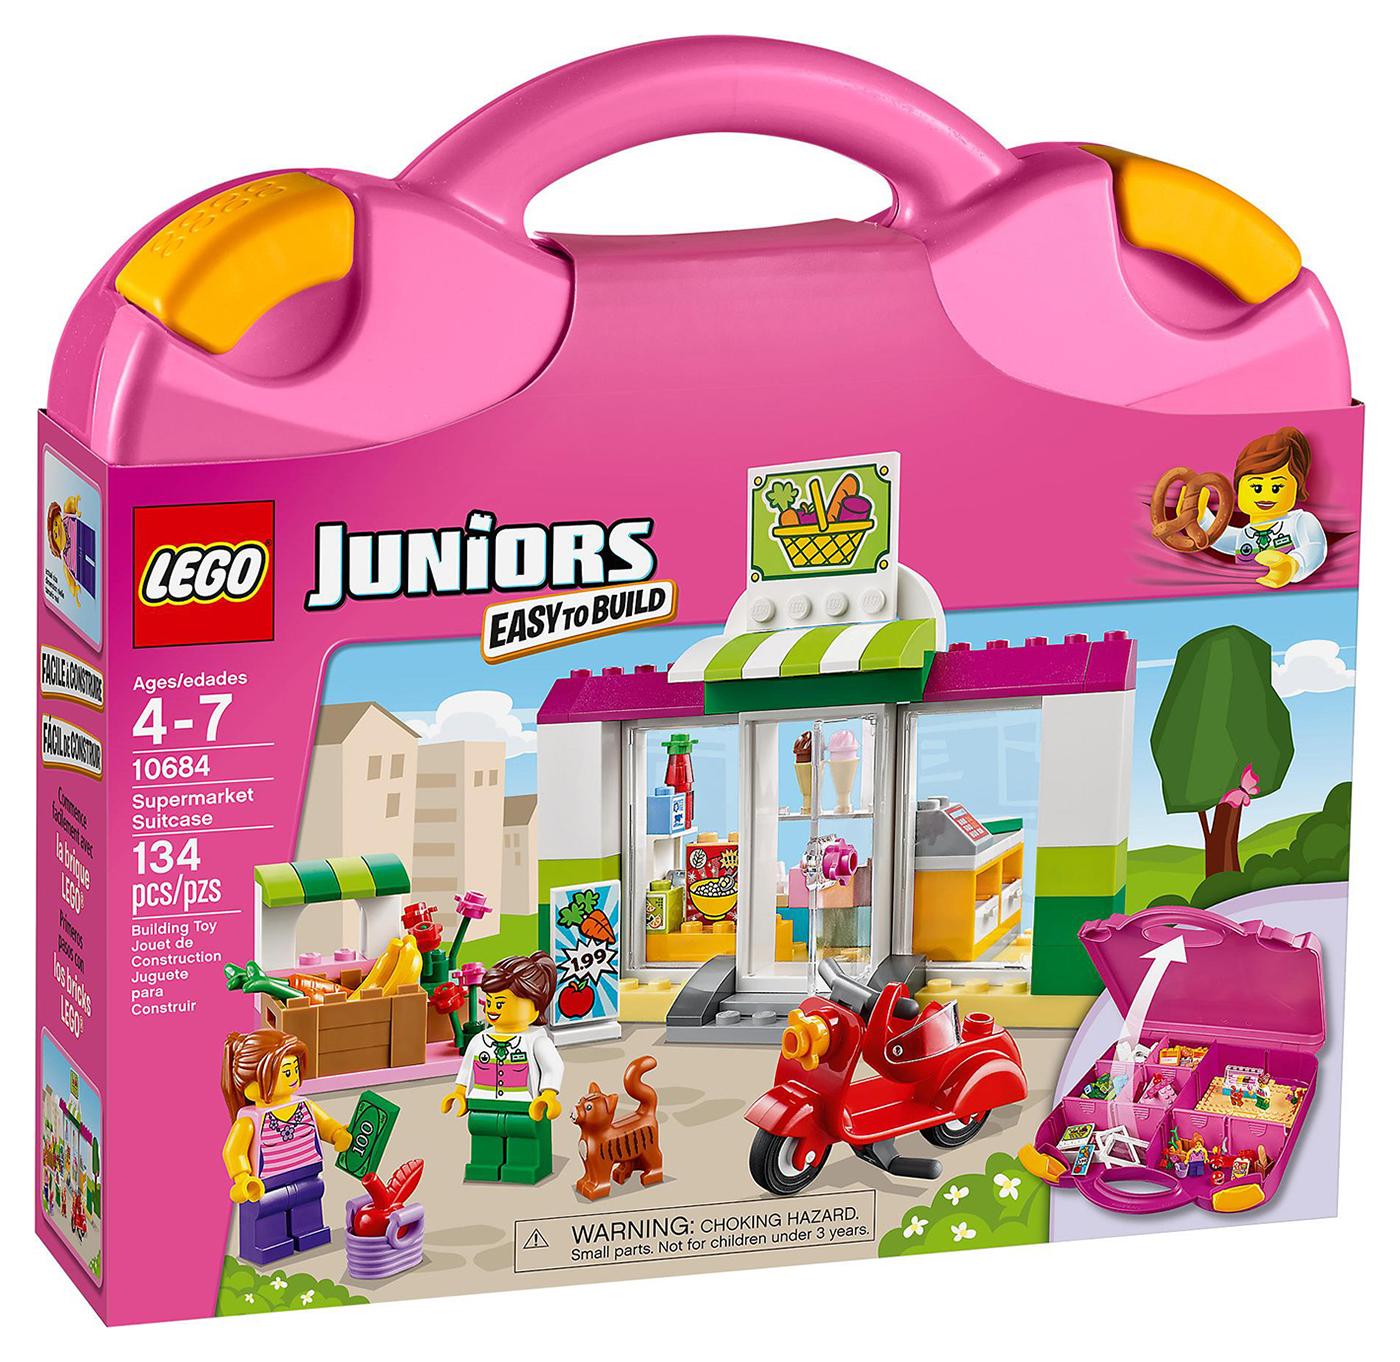 lego juniors 10684 pas cher la valise supermarch. Black Bedroom Furniture Sets. Home Design Ideas